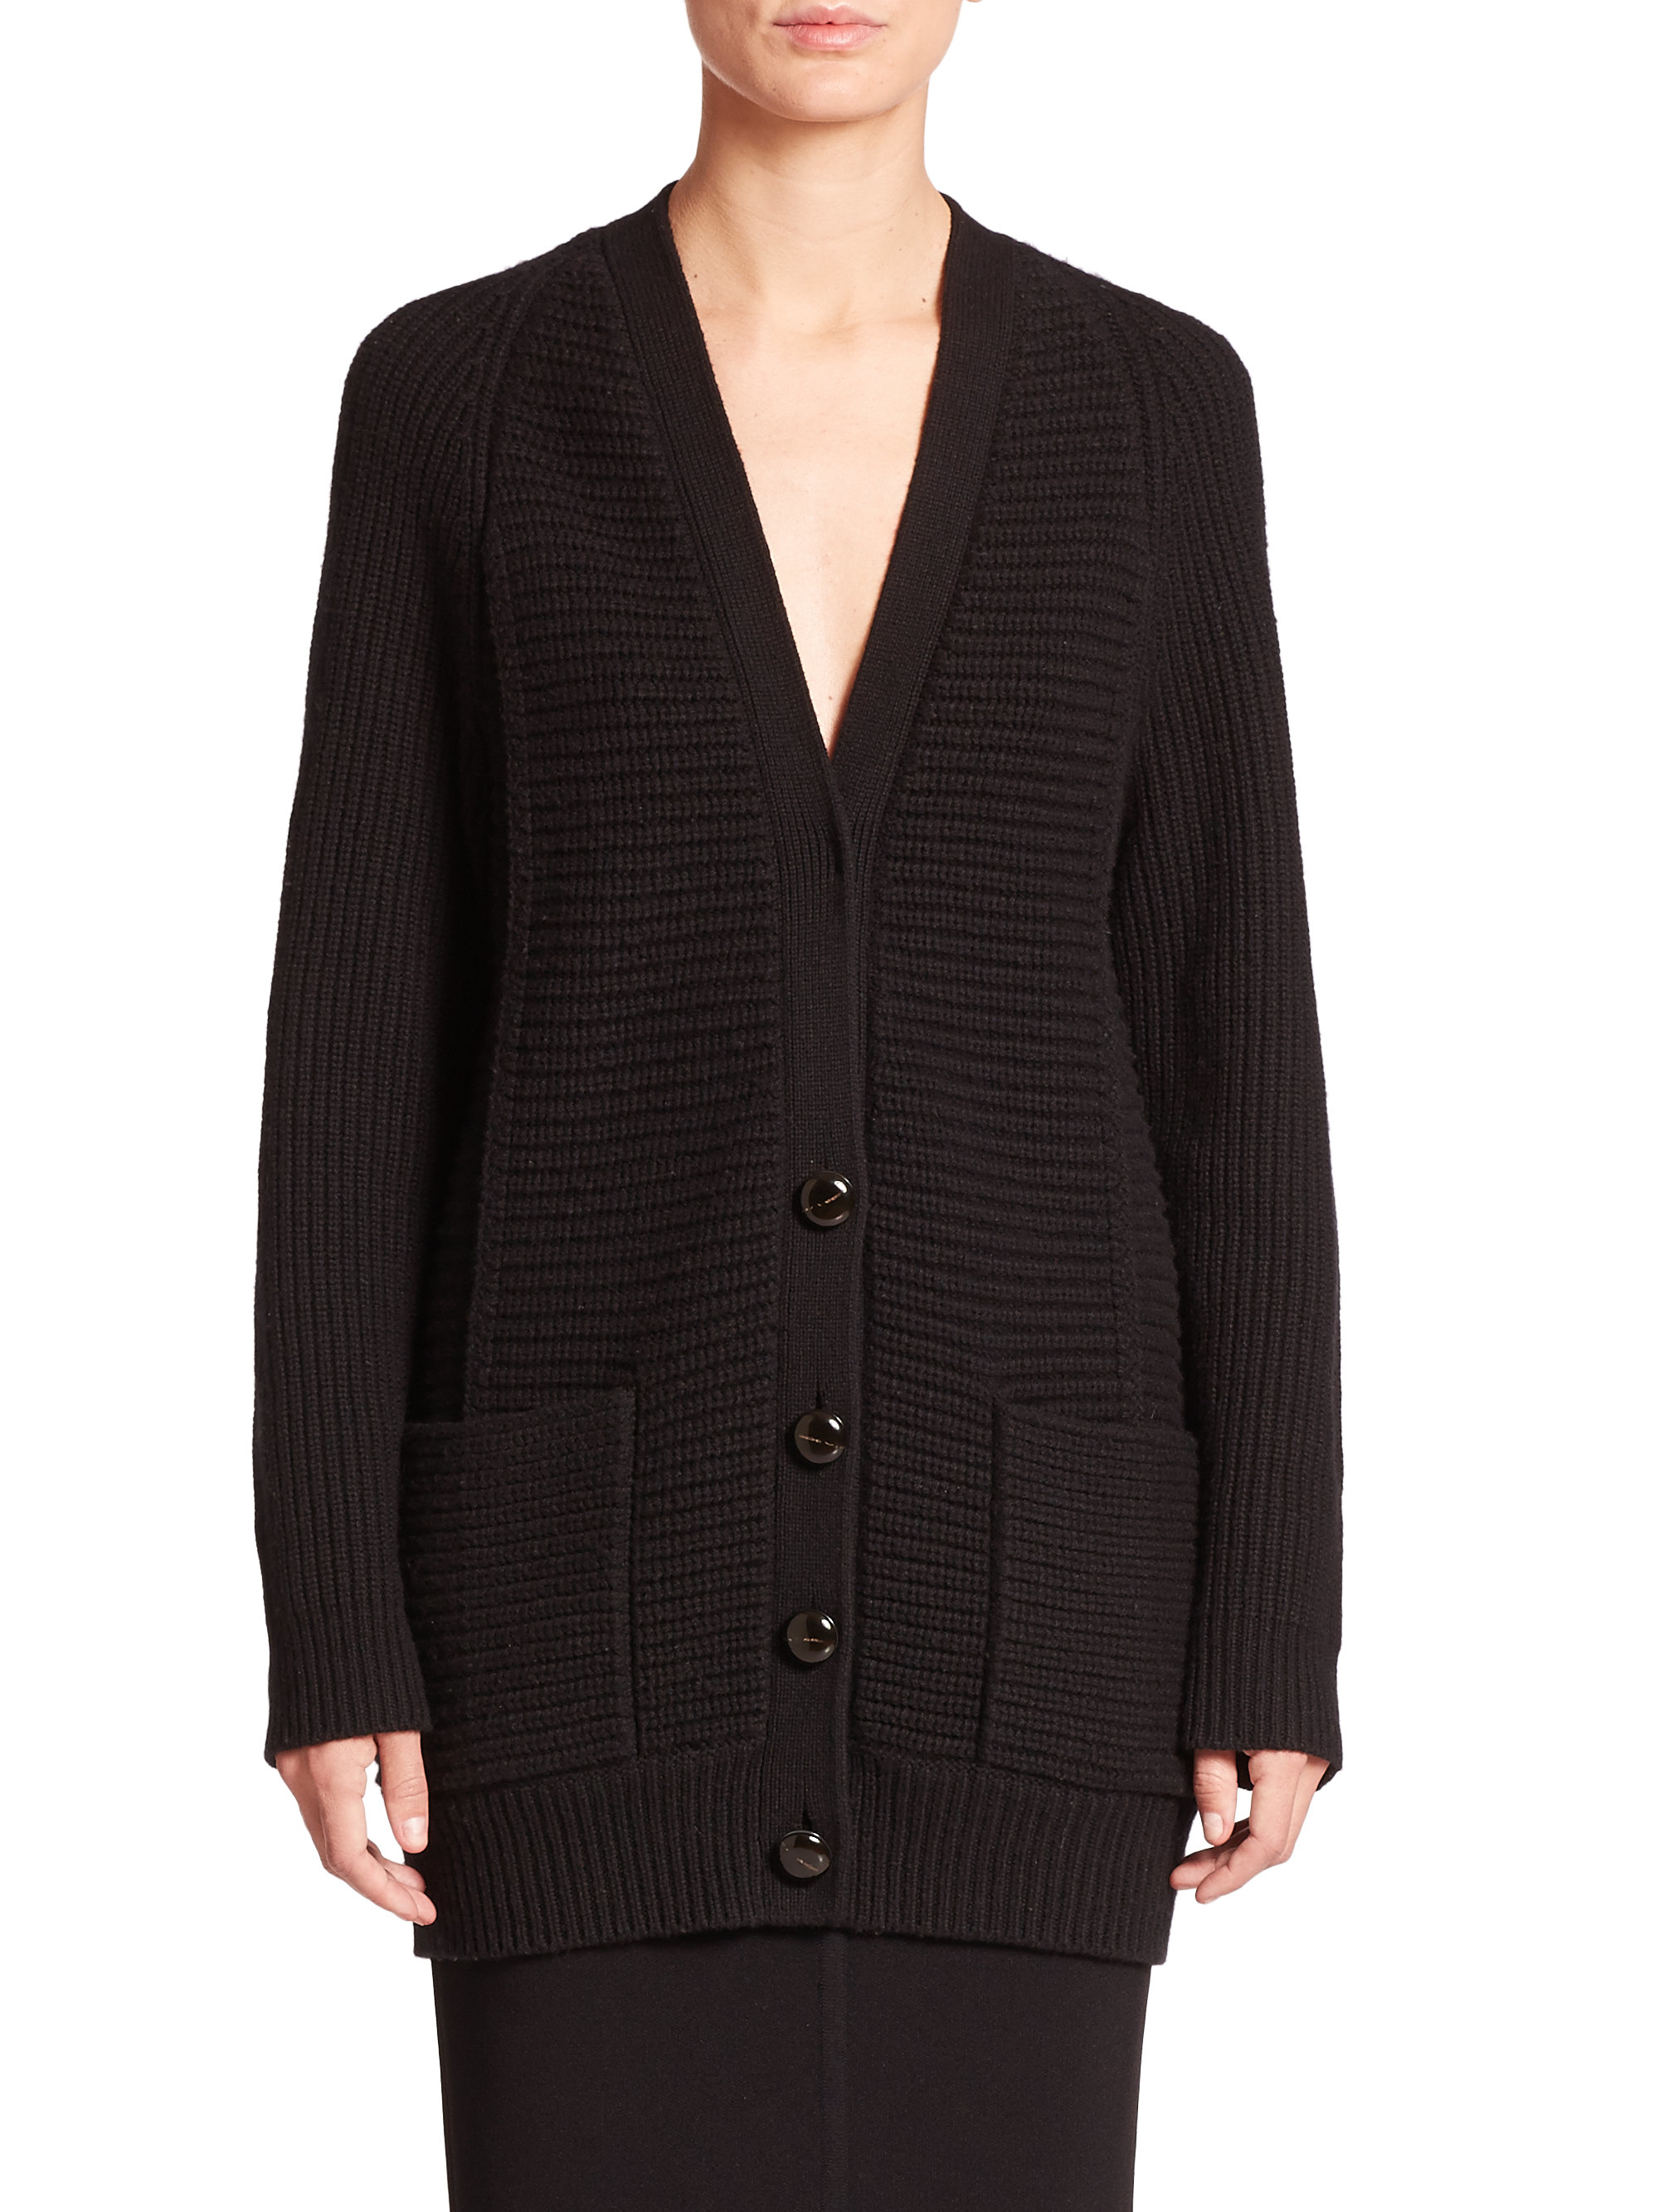 Proenza schouler Wool & Cashmere Boyfriend Cardigan in Black | Lyst